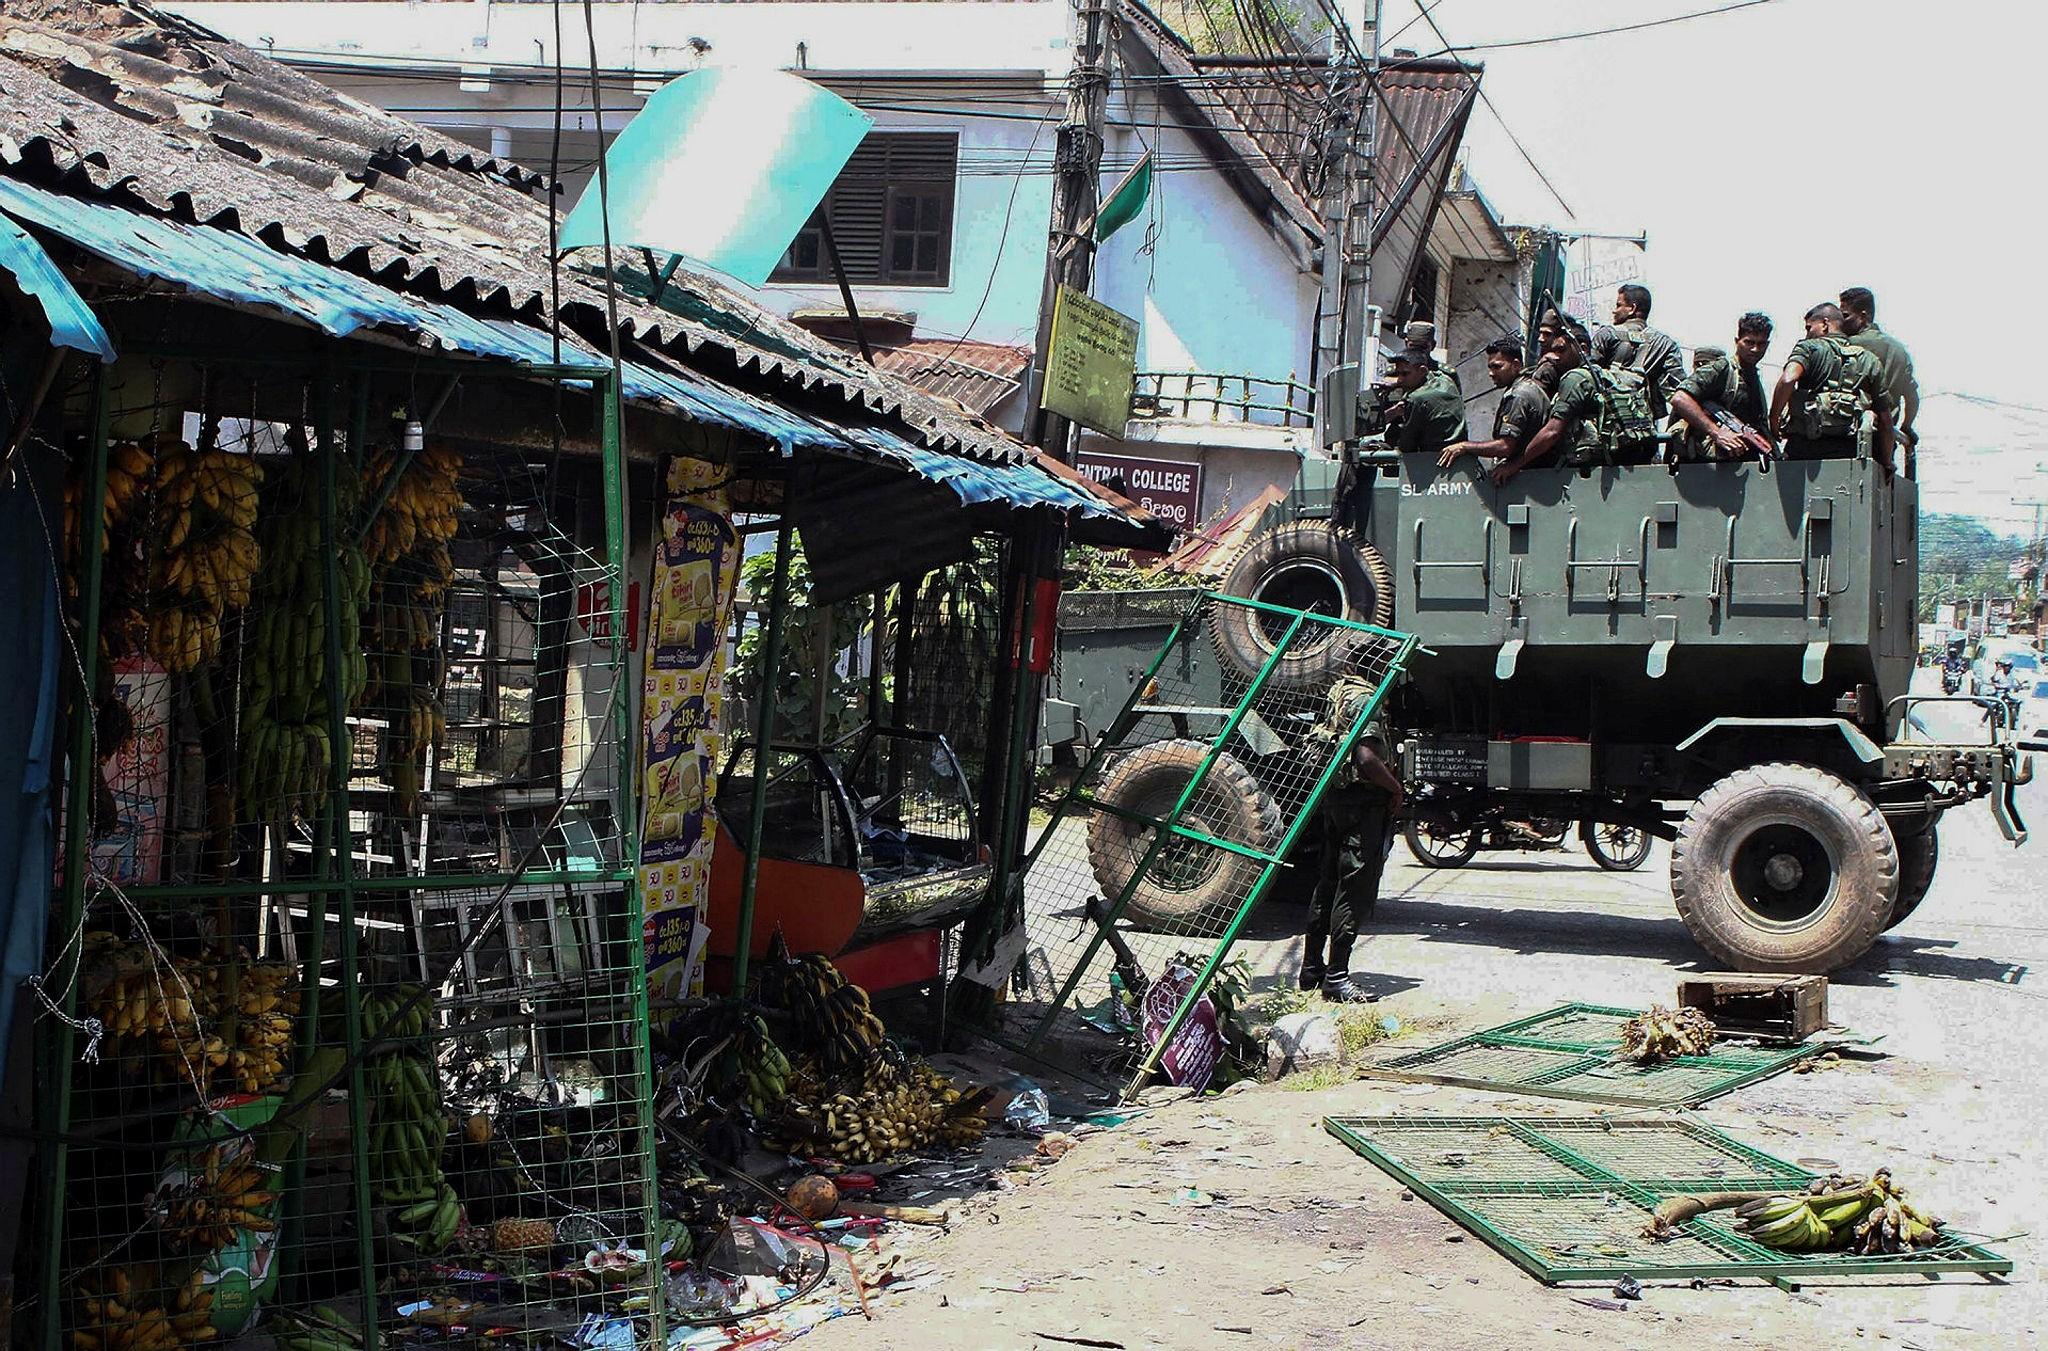 Sri Lankan army patrol the streets of Katugastota, a suburb of Kandy, March 8.